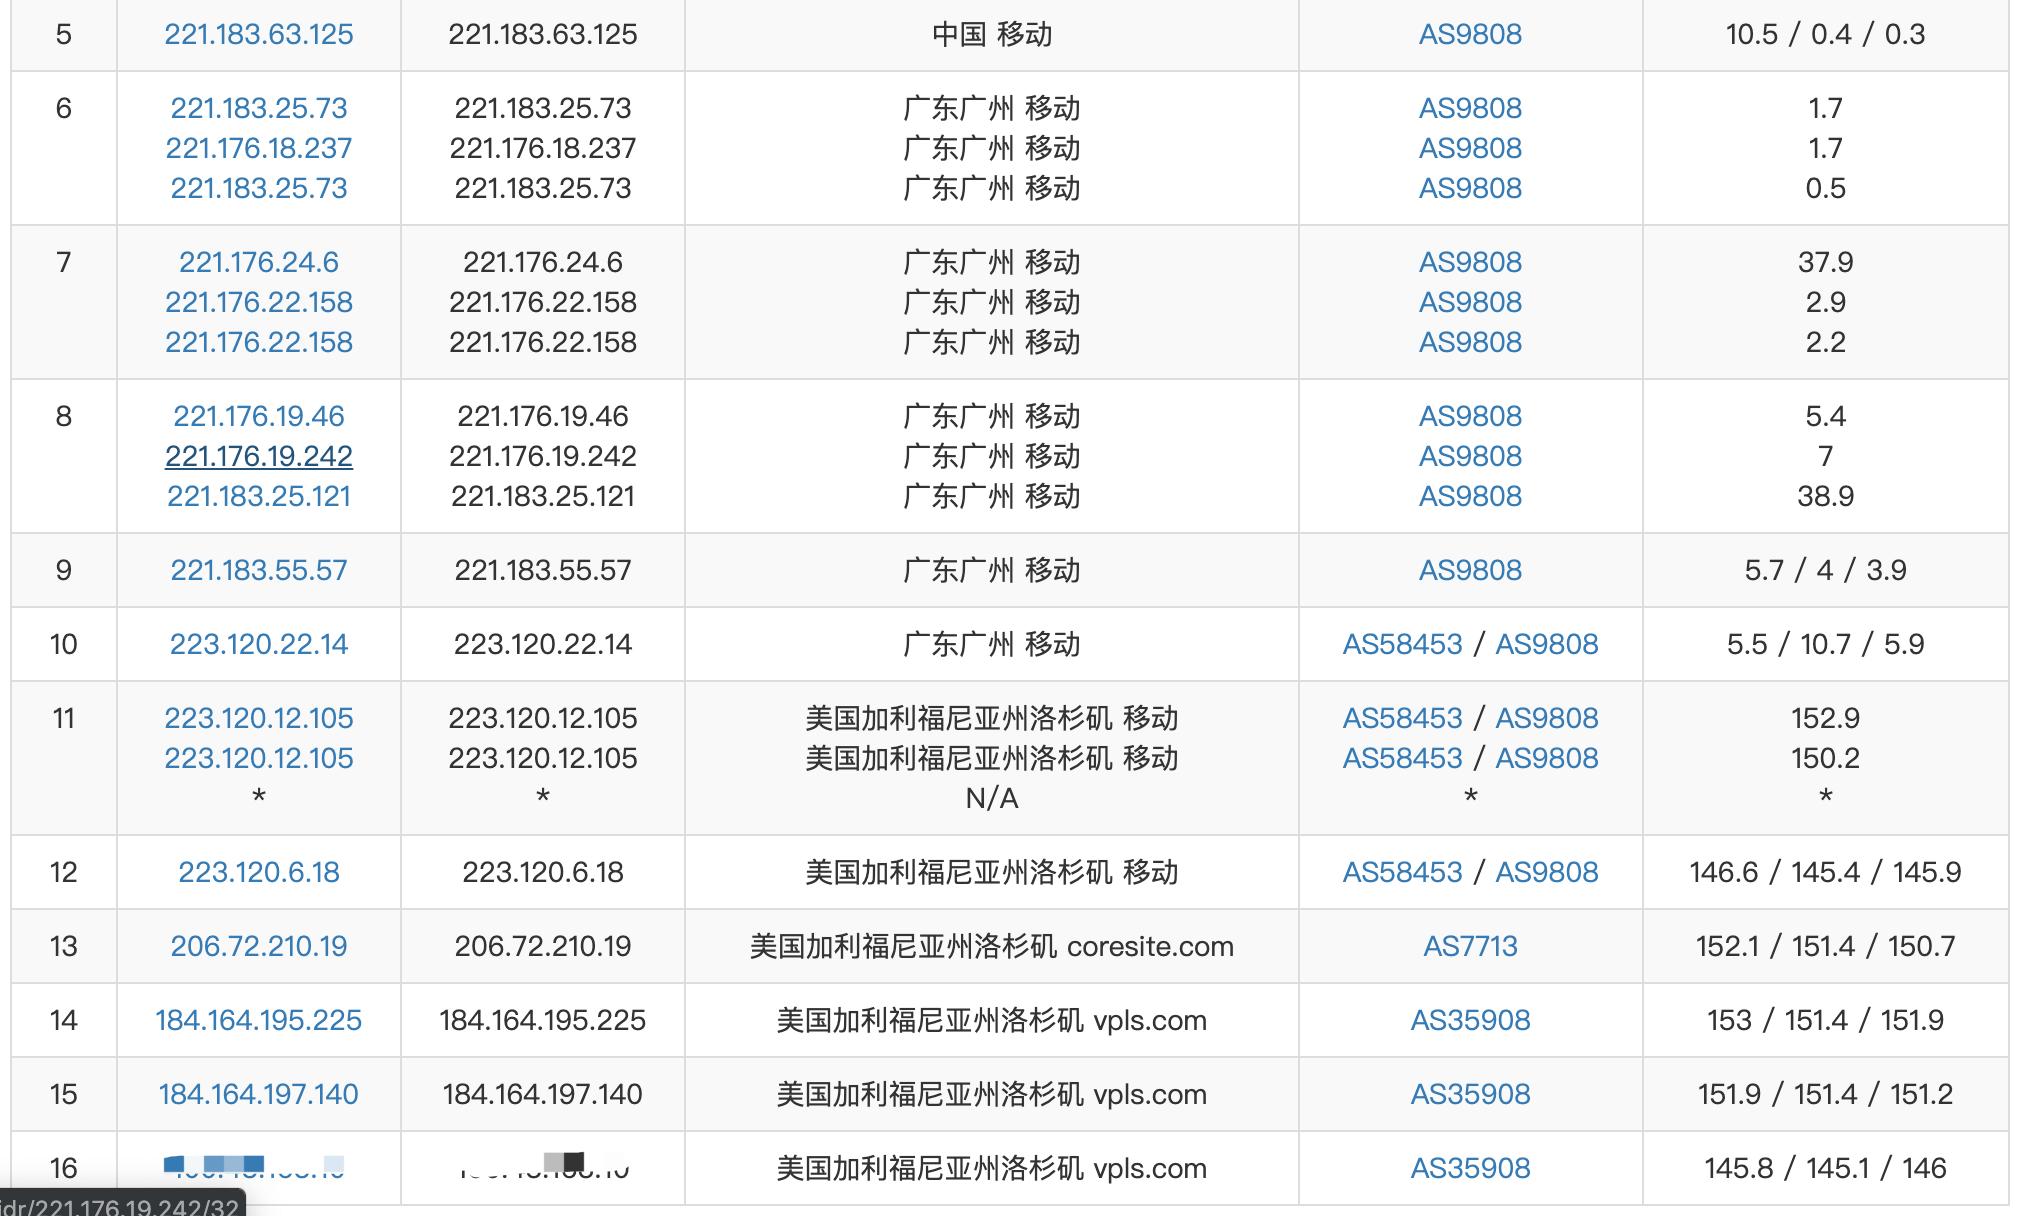 Krypt子品牌iON洛杉矶CN2 GT网络KVM VPS服务器1G内存方案测试数据-VPS推荐网